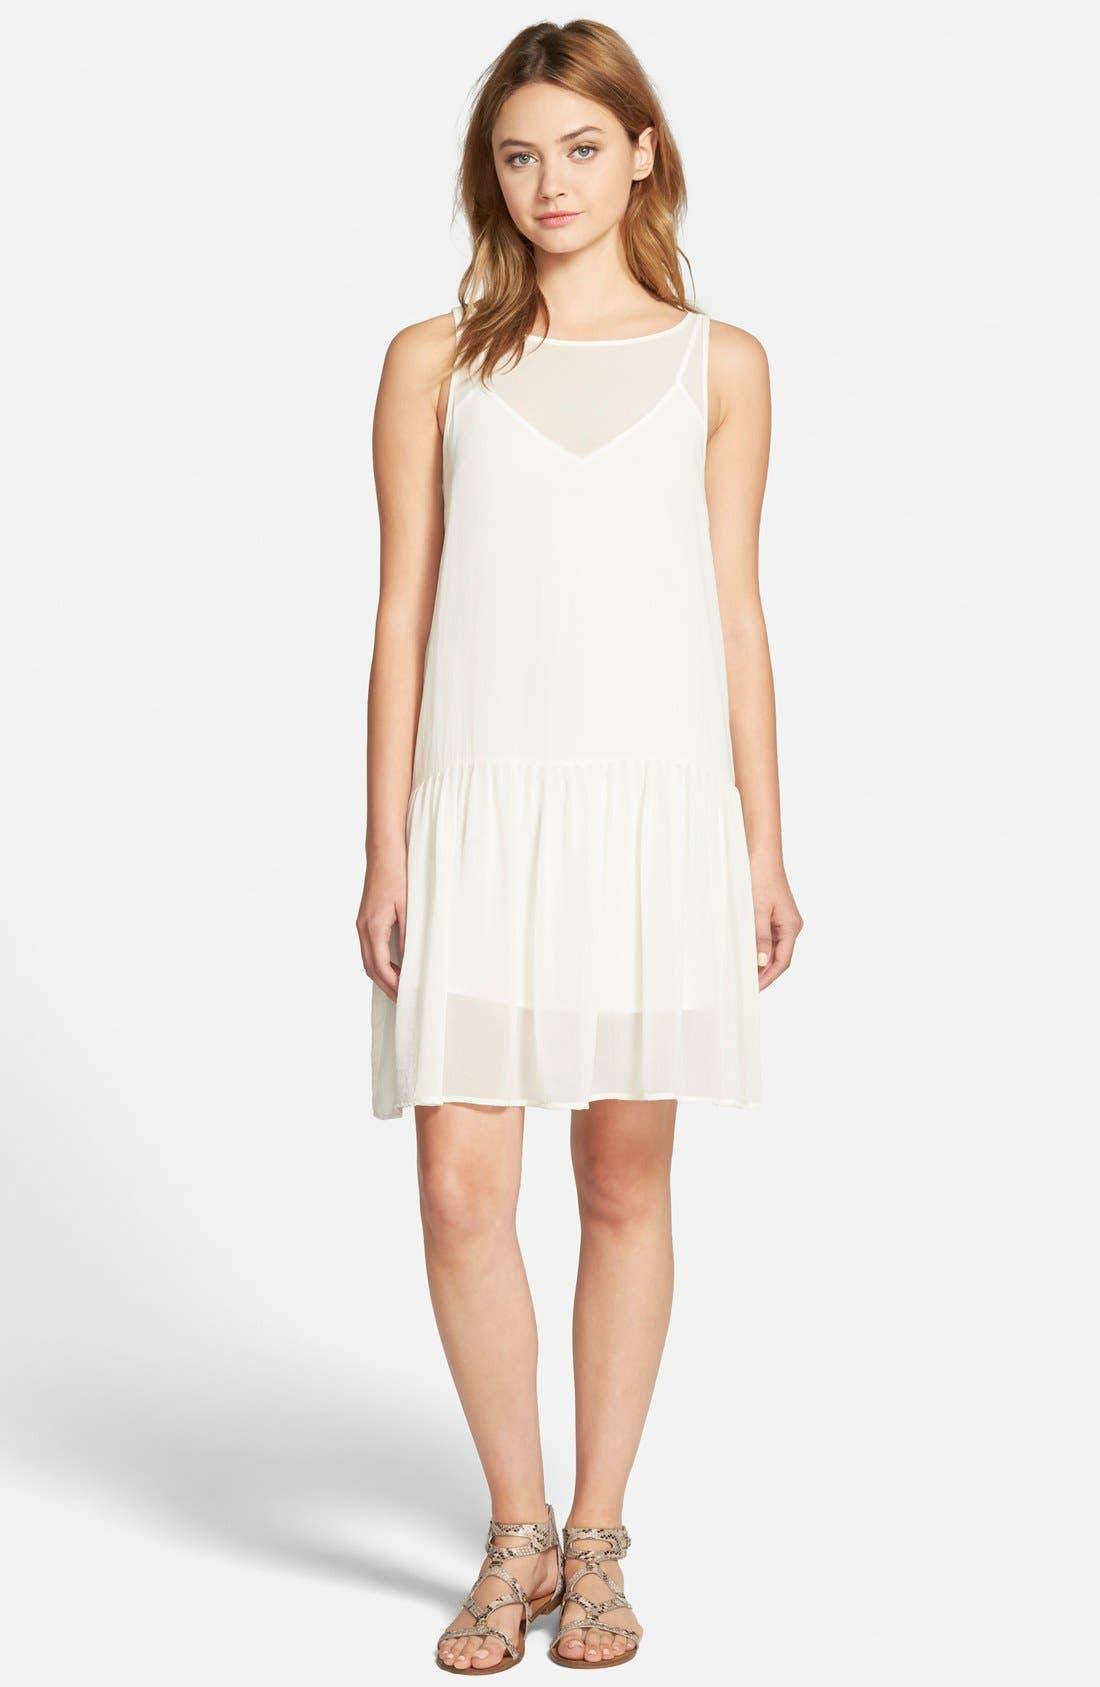 Alternate Image 1 Selected - cupcakes and cashmere 'Laurel' Sleeveless Chiffon Dress